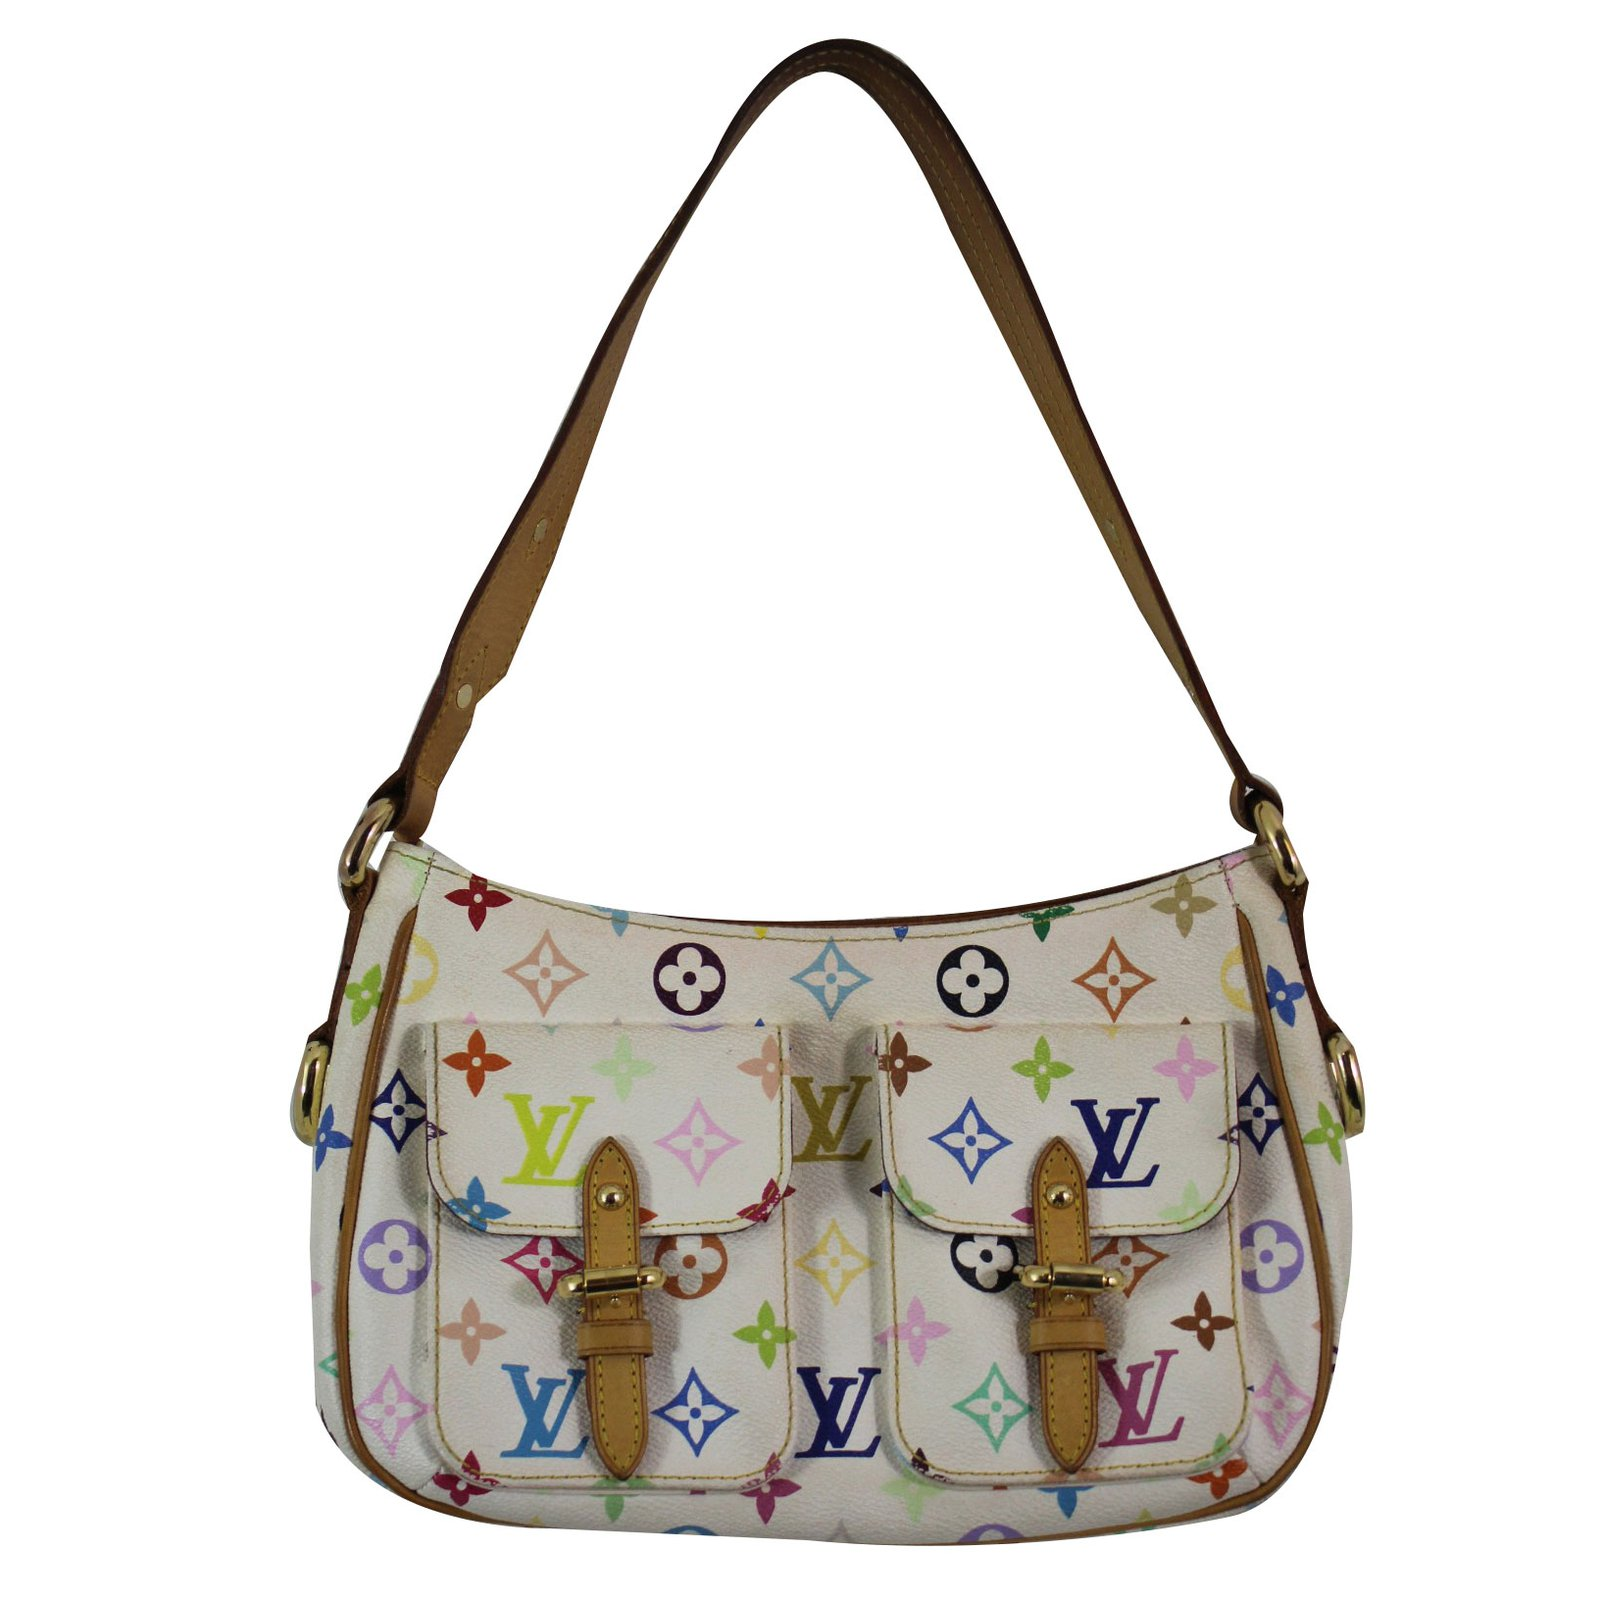 Louis Vuitton Handbag Handbags Suede Leather Multiple Colors Ref 61116